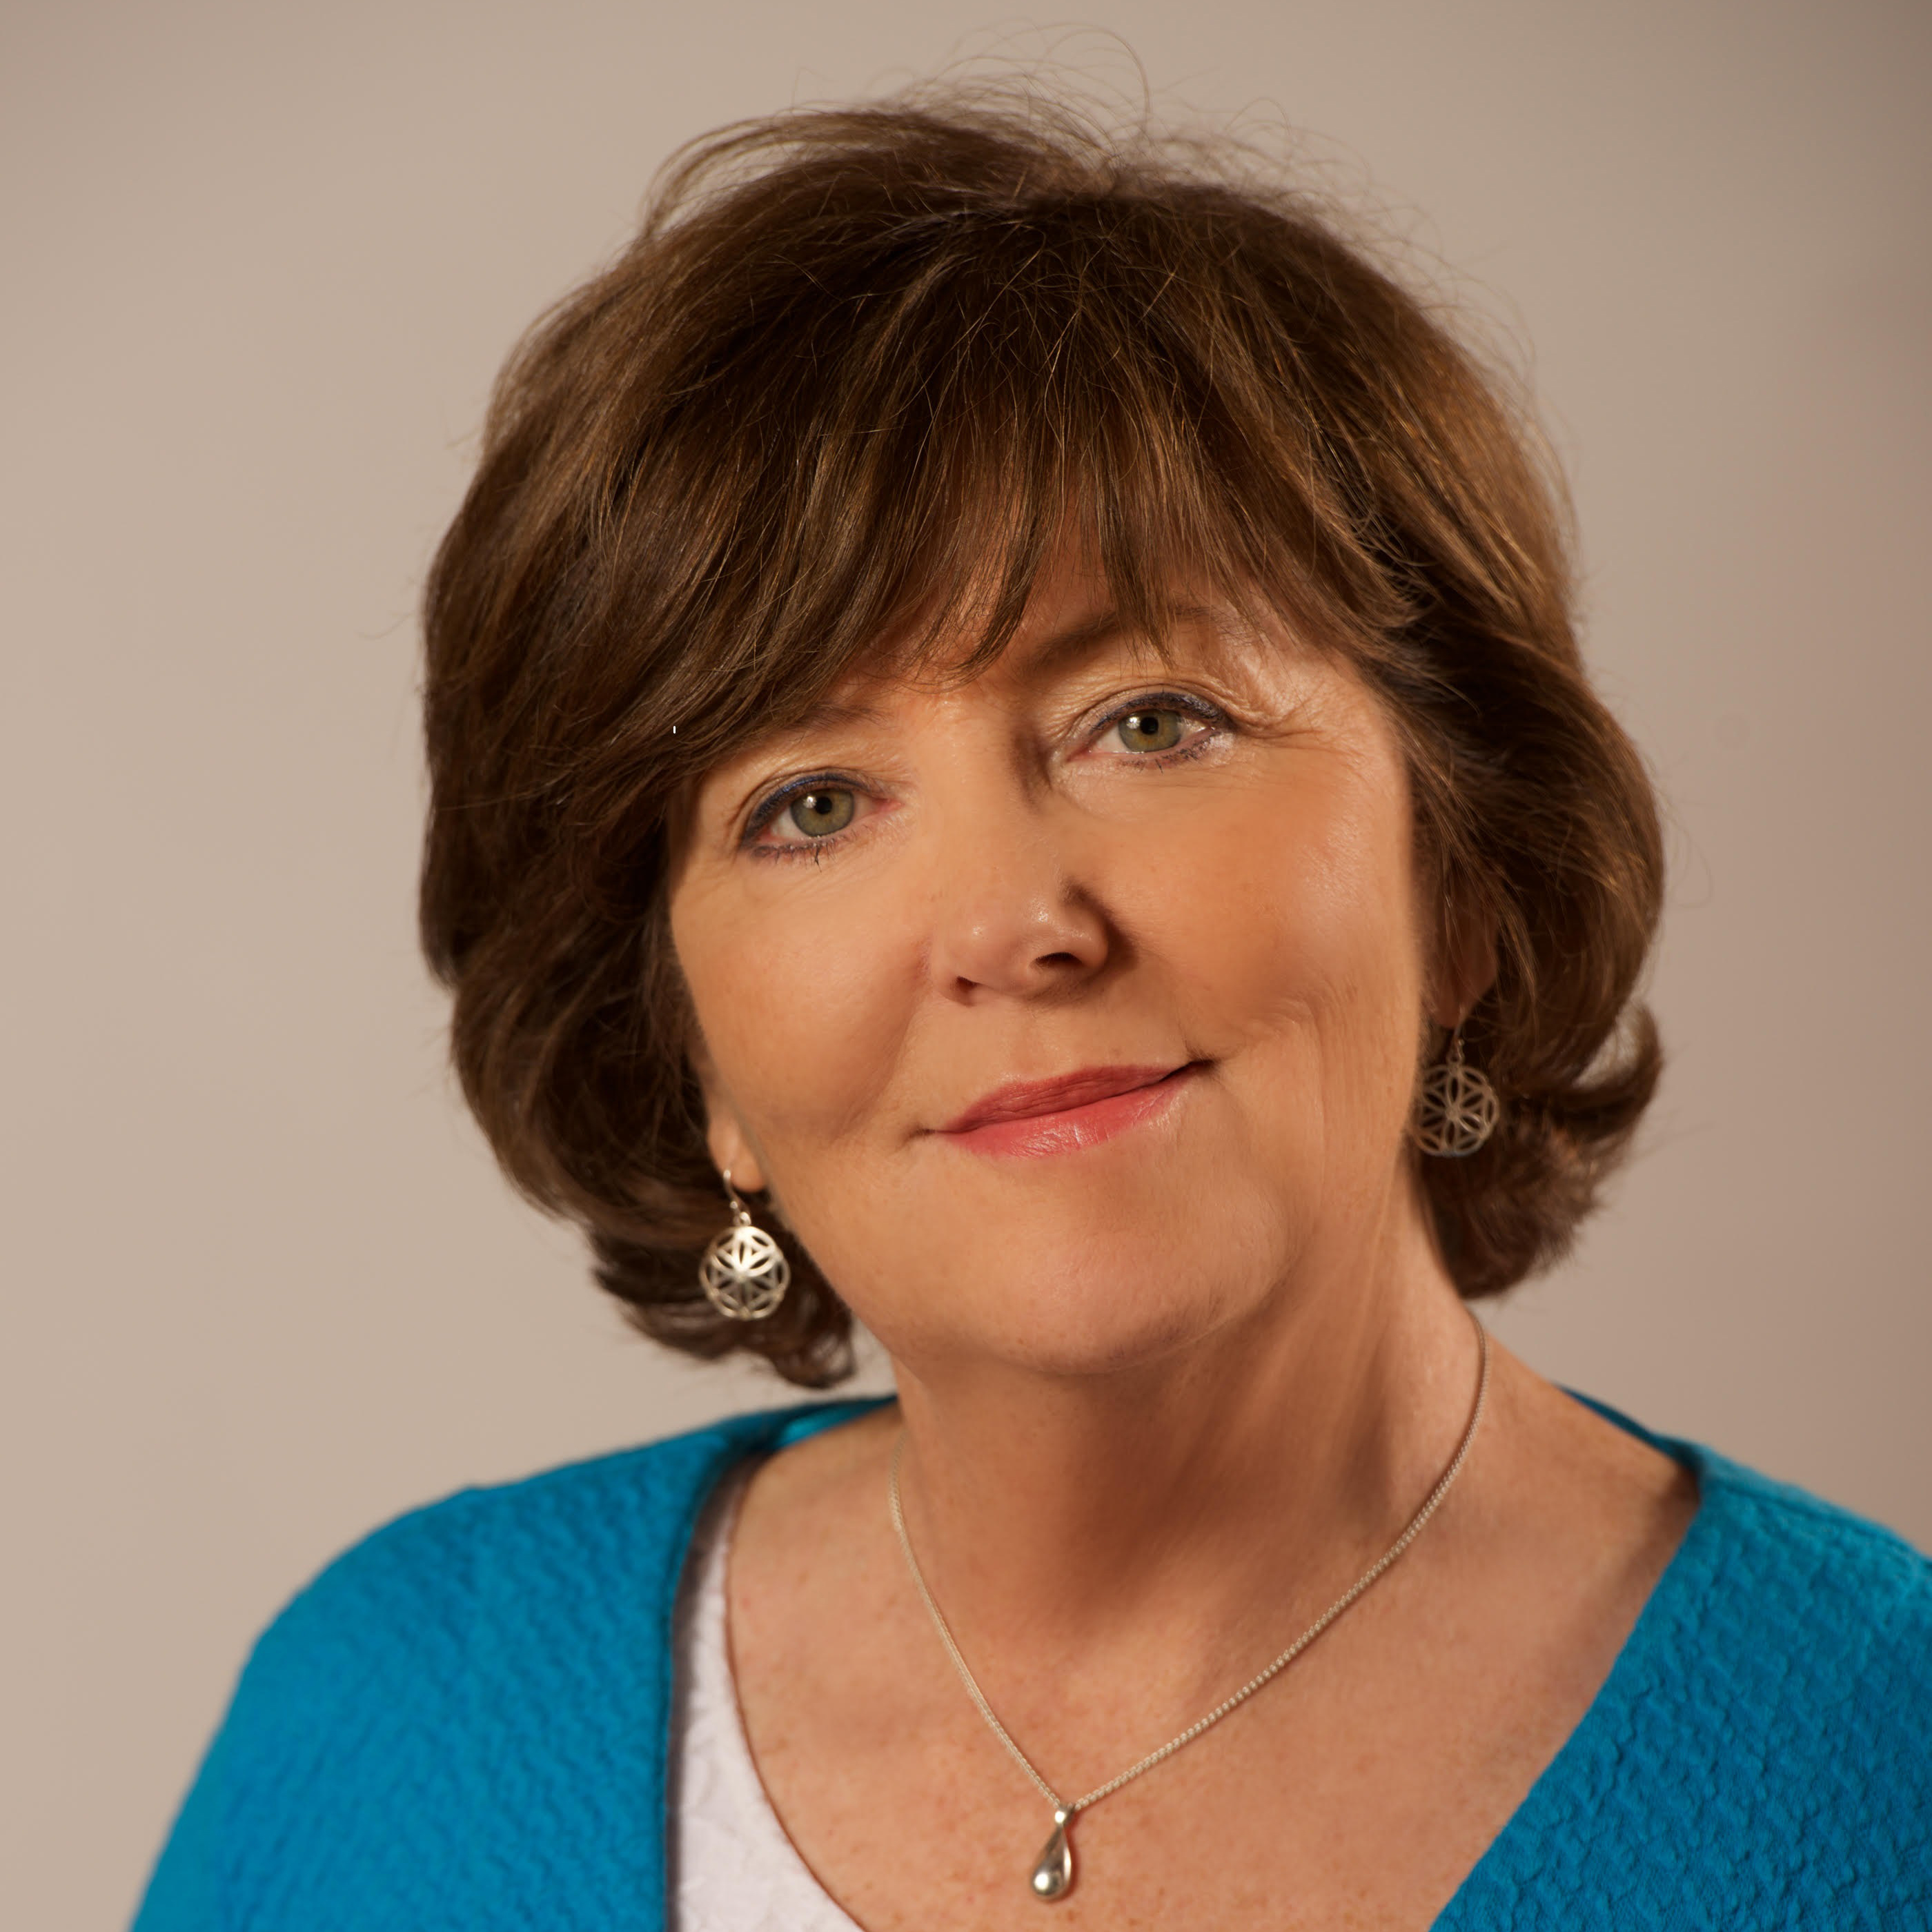 Denise Sears